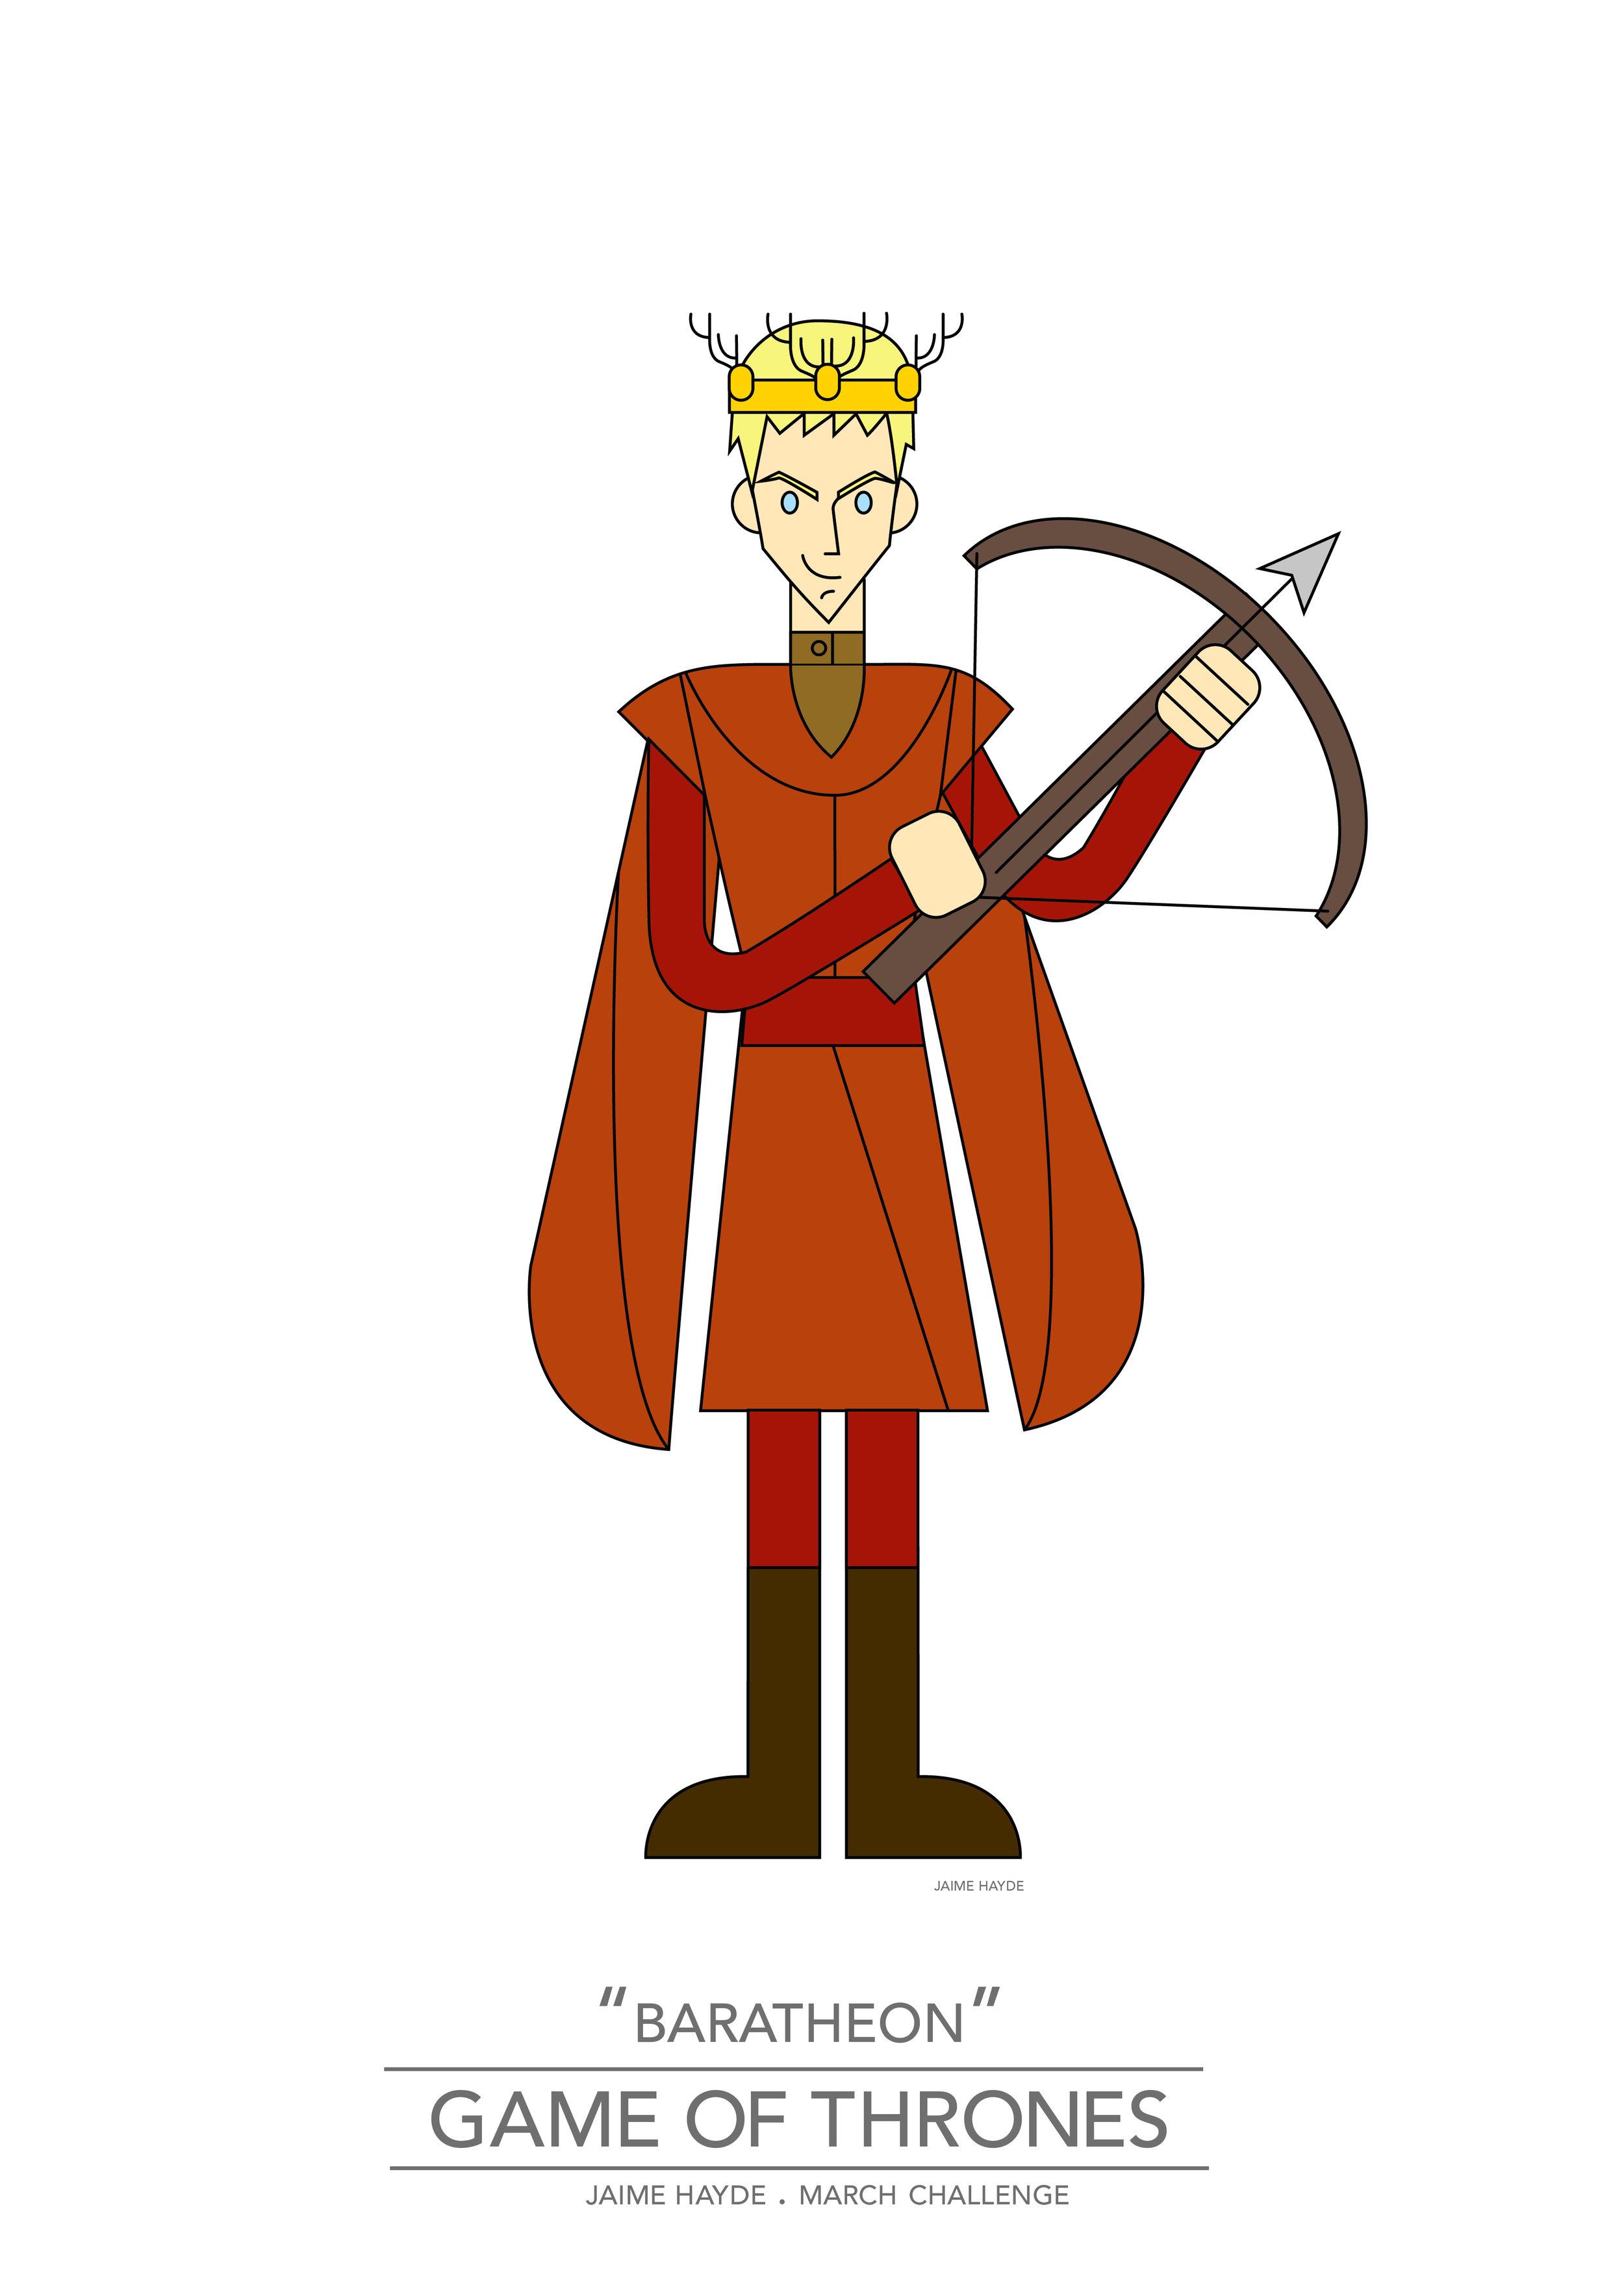 Game-of-thrones-Juego-de-tronos-illustration poster baratheon.jpg